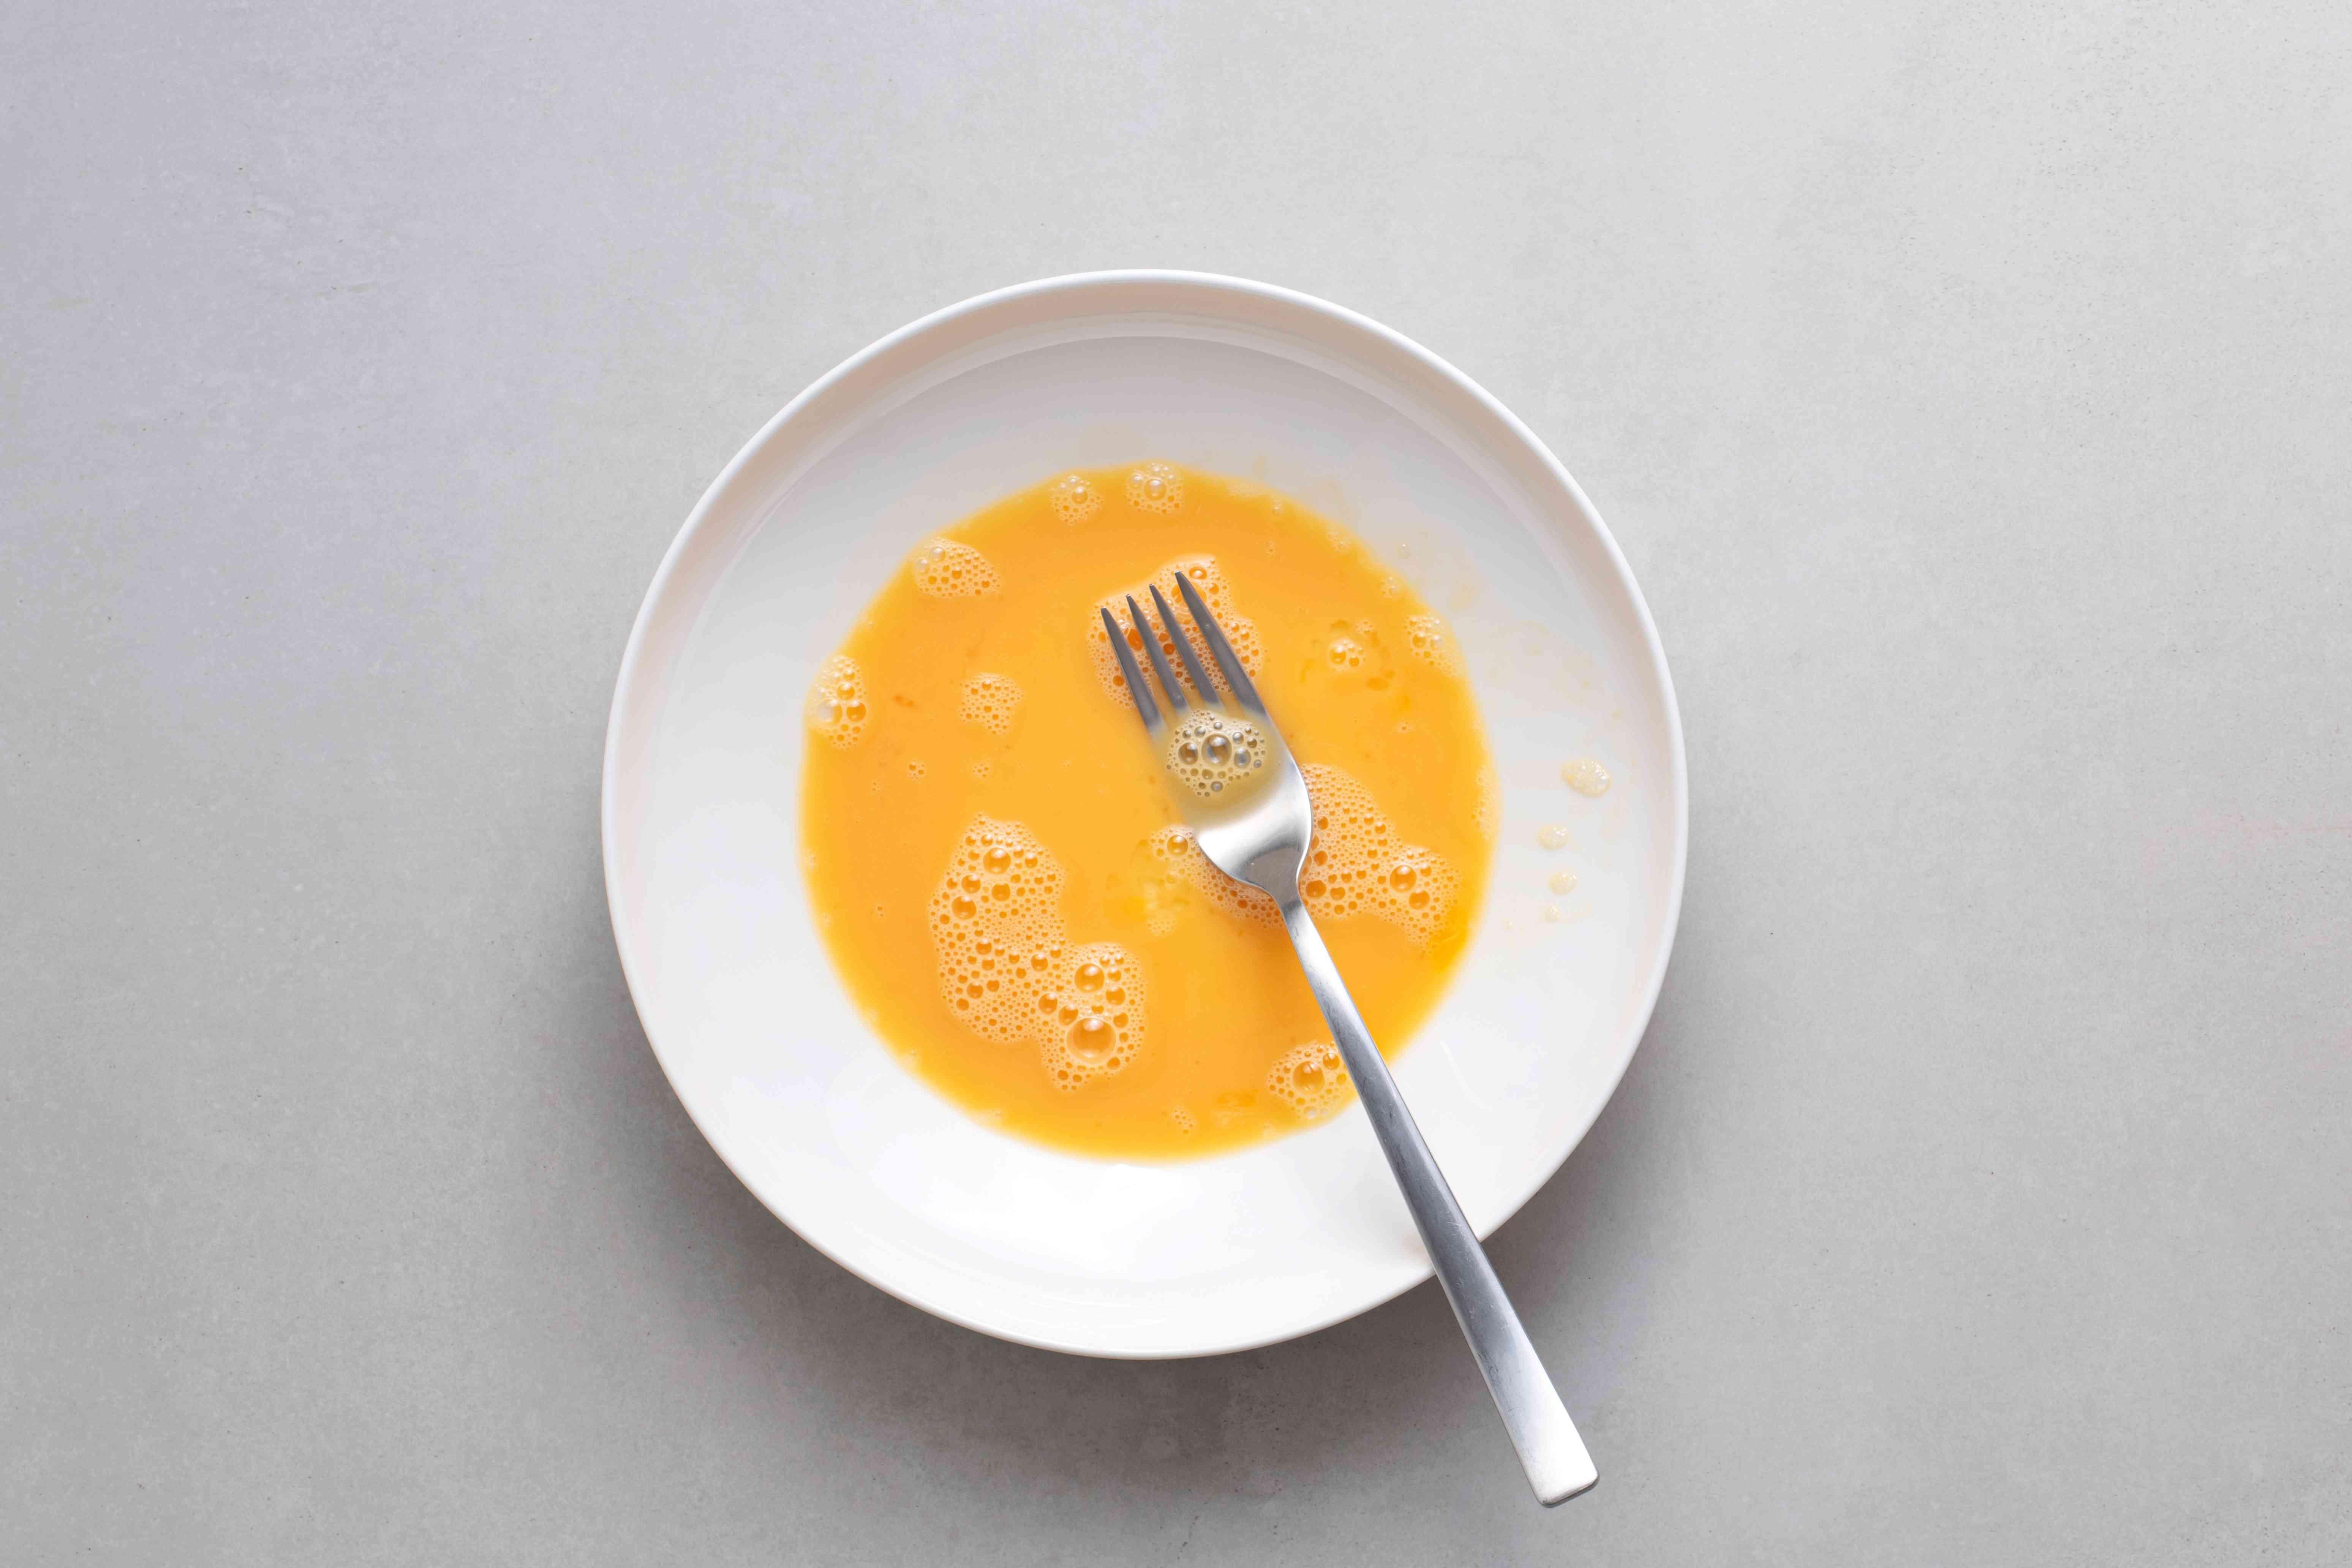 beaten egg in a bowl